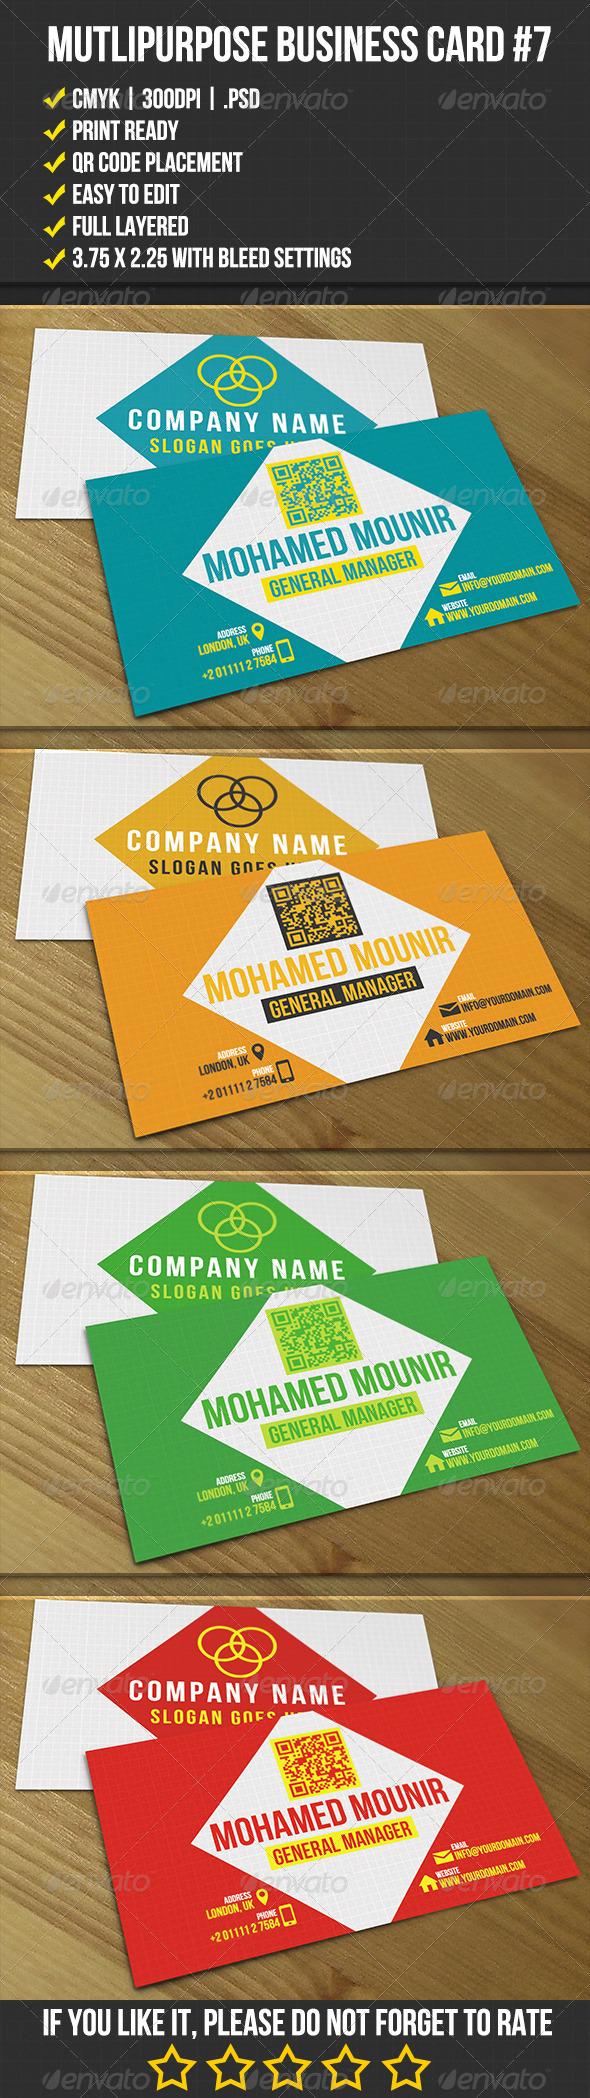 GraphicRiver Multipurpose Business Card 7 4384372